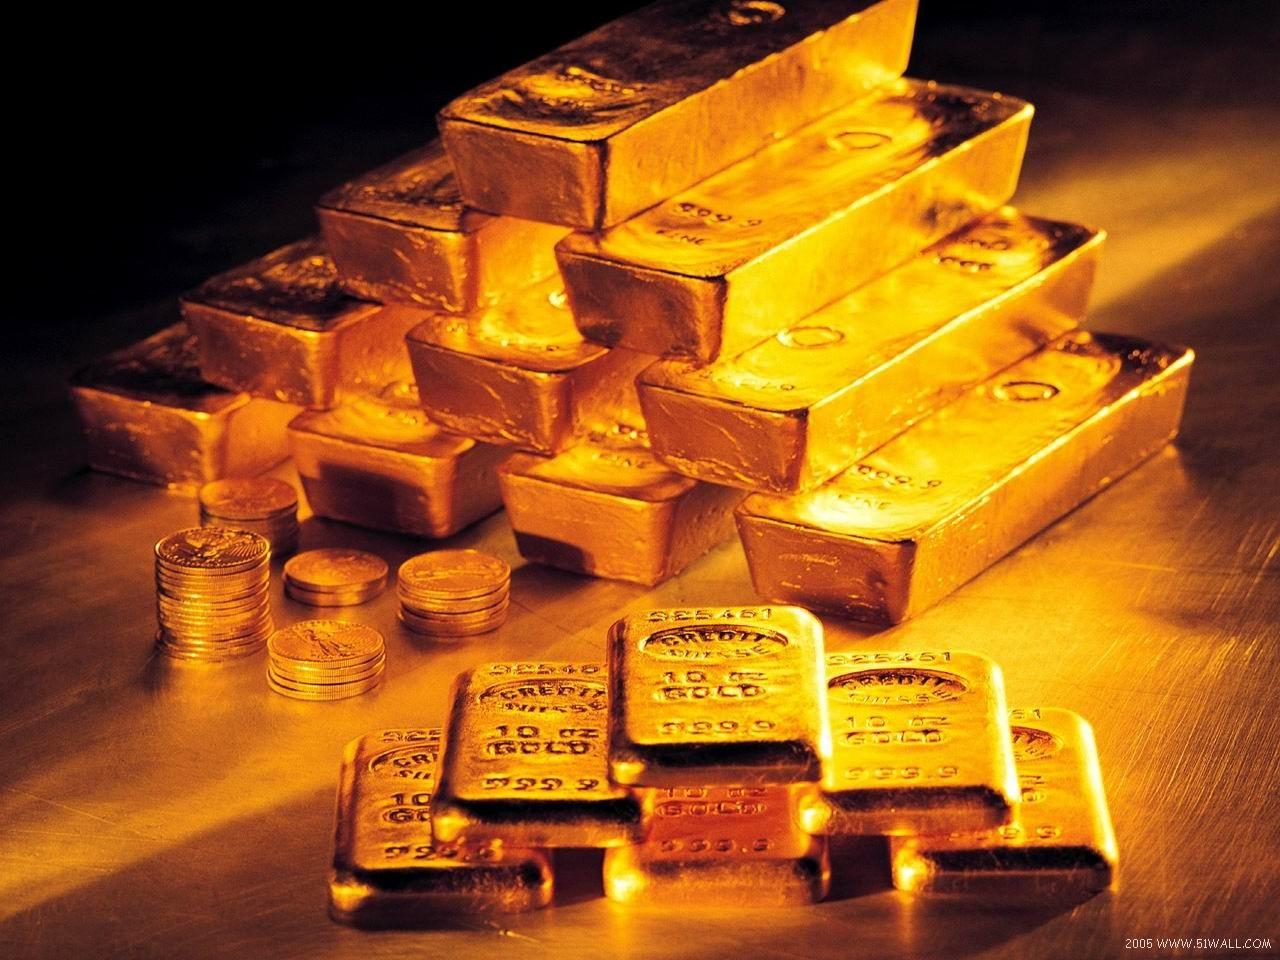 скупка золота 1200 руб/гр